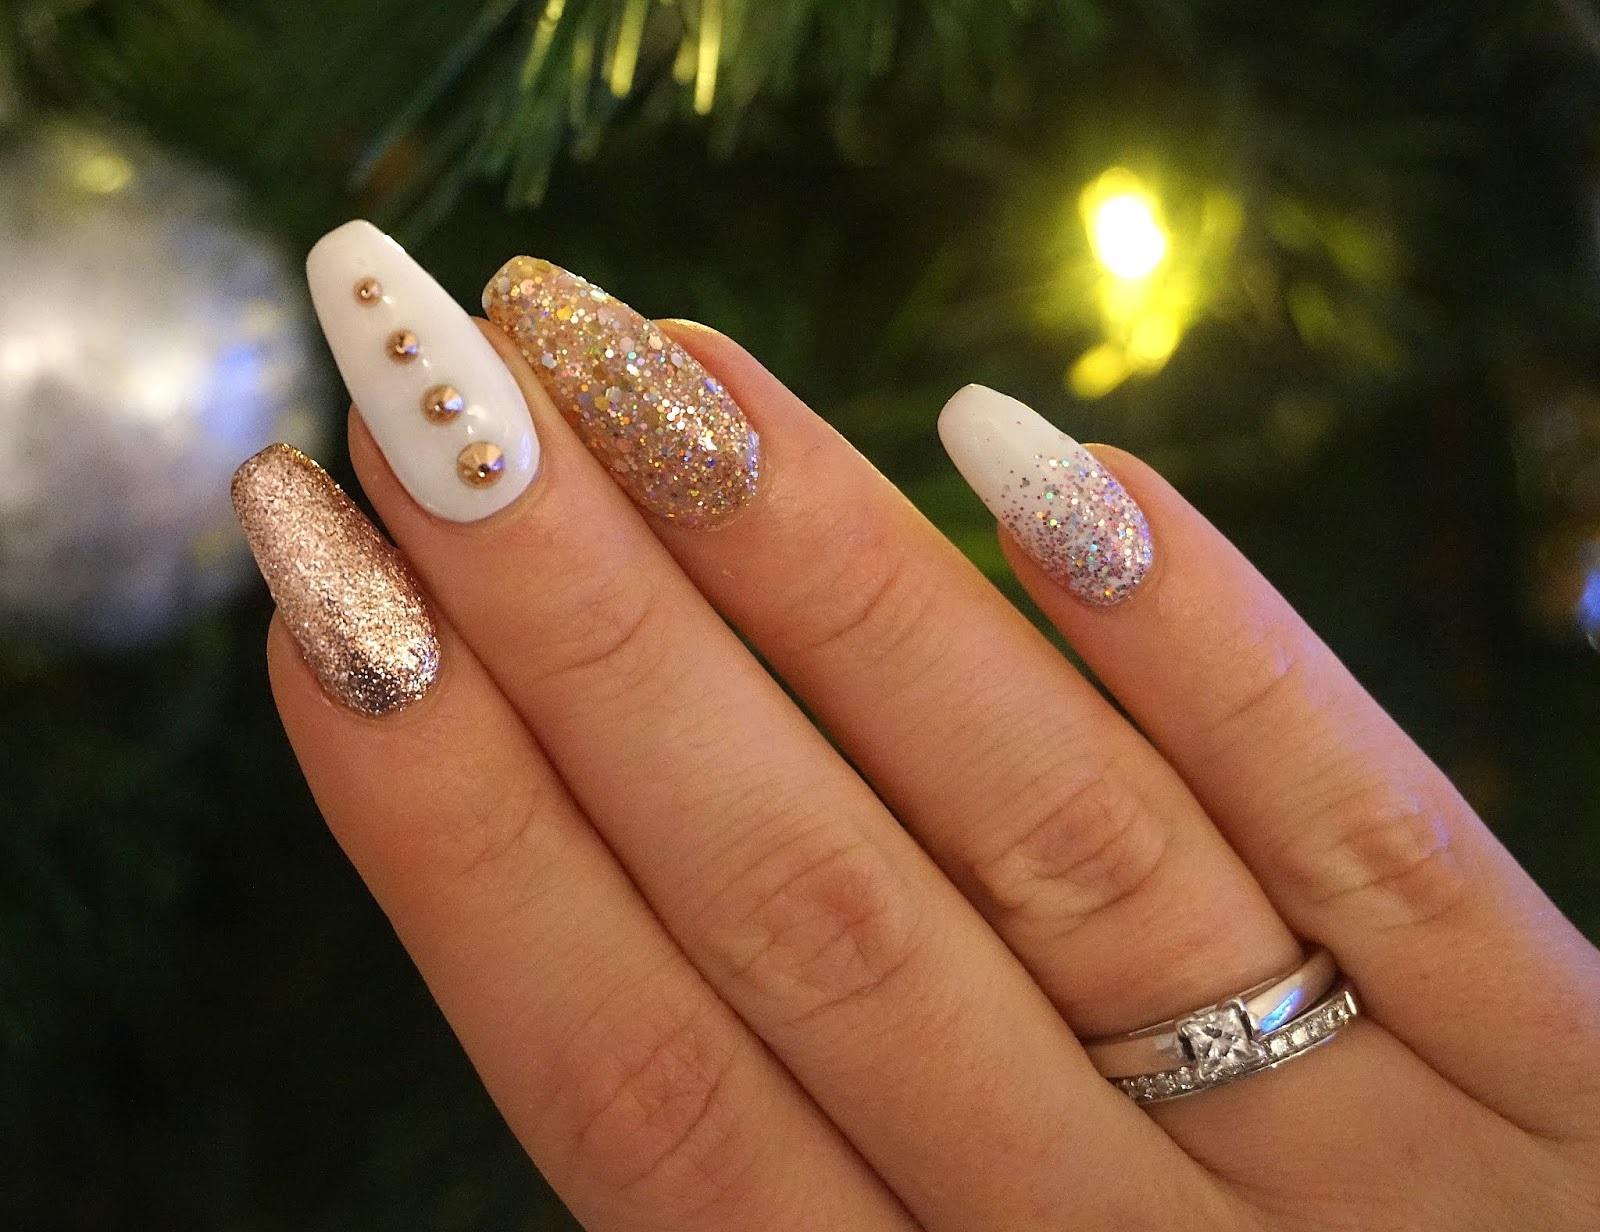 Manucure festive.